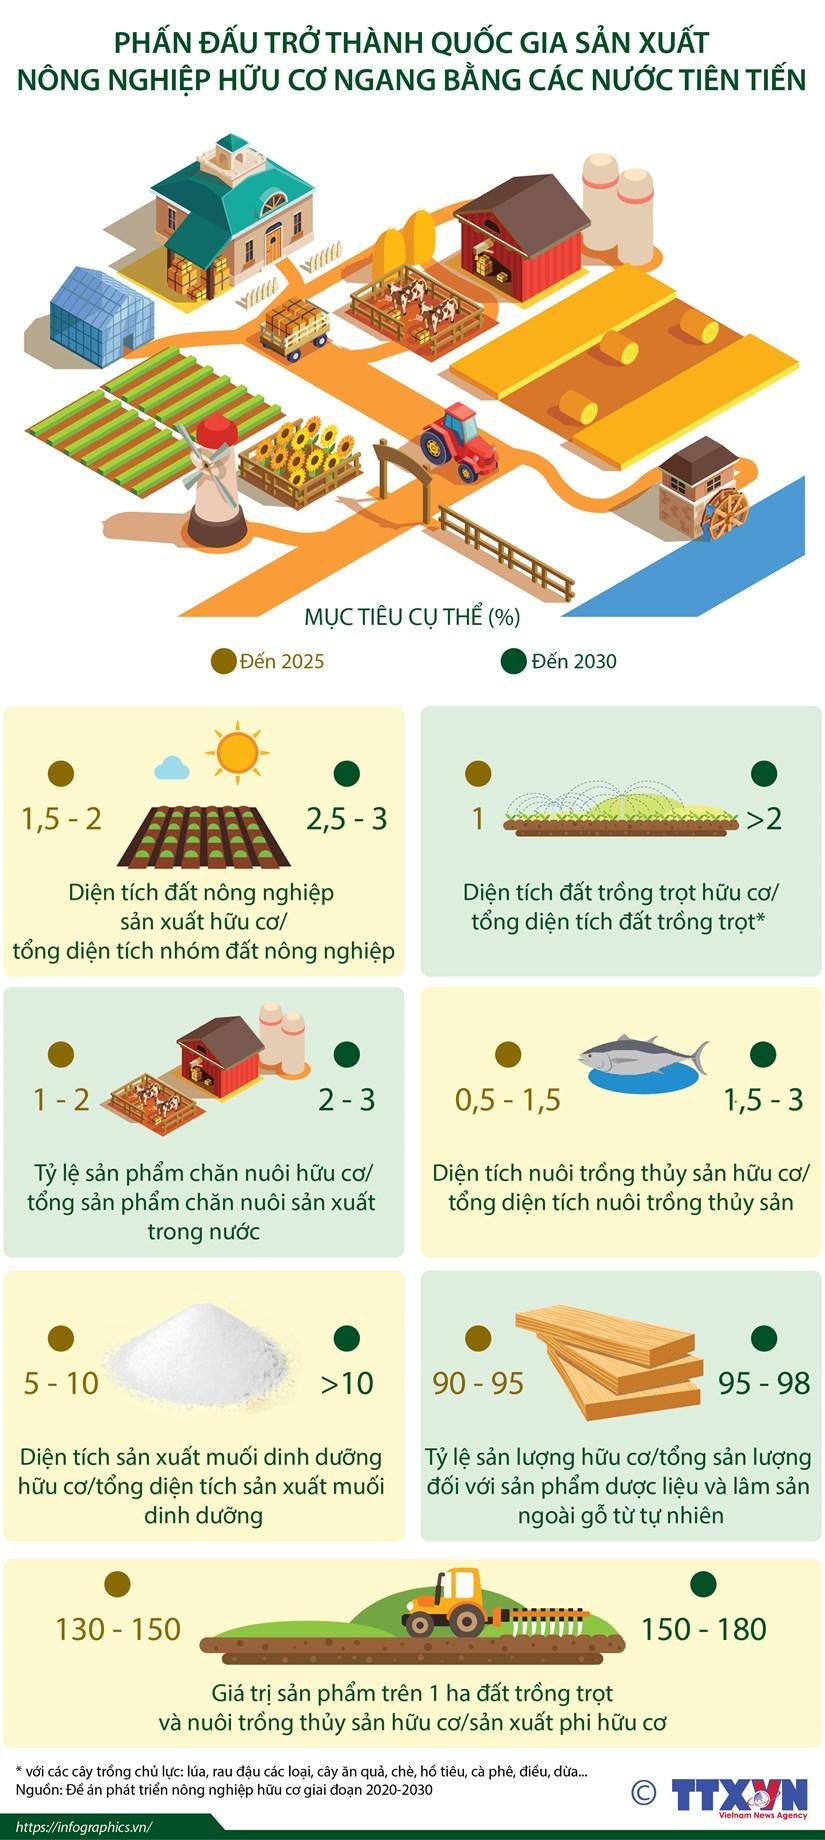 [Infographics] Phat trien nen nong nghiep huu co ben vung hinh anh 1